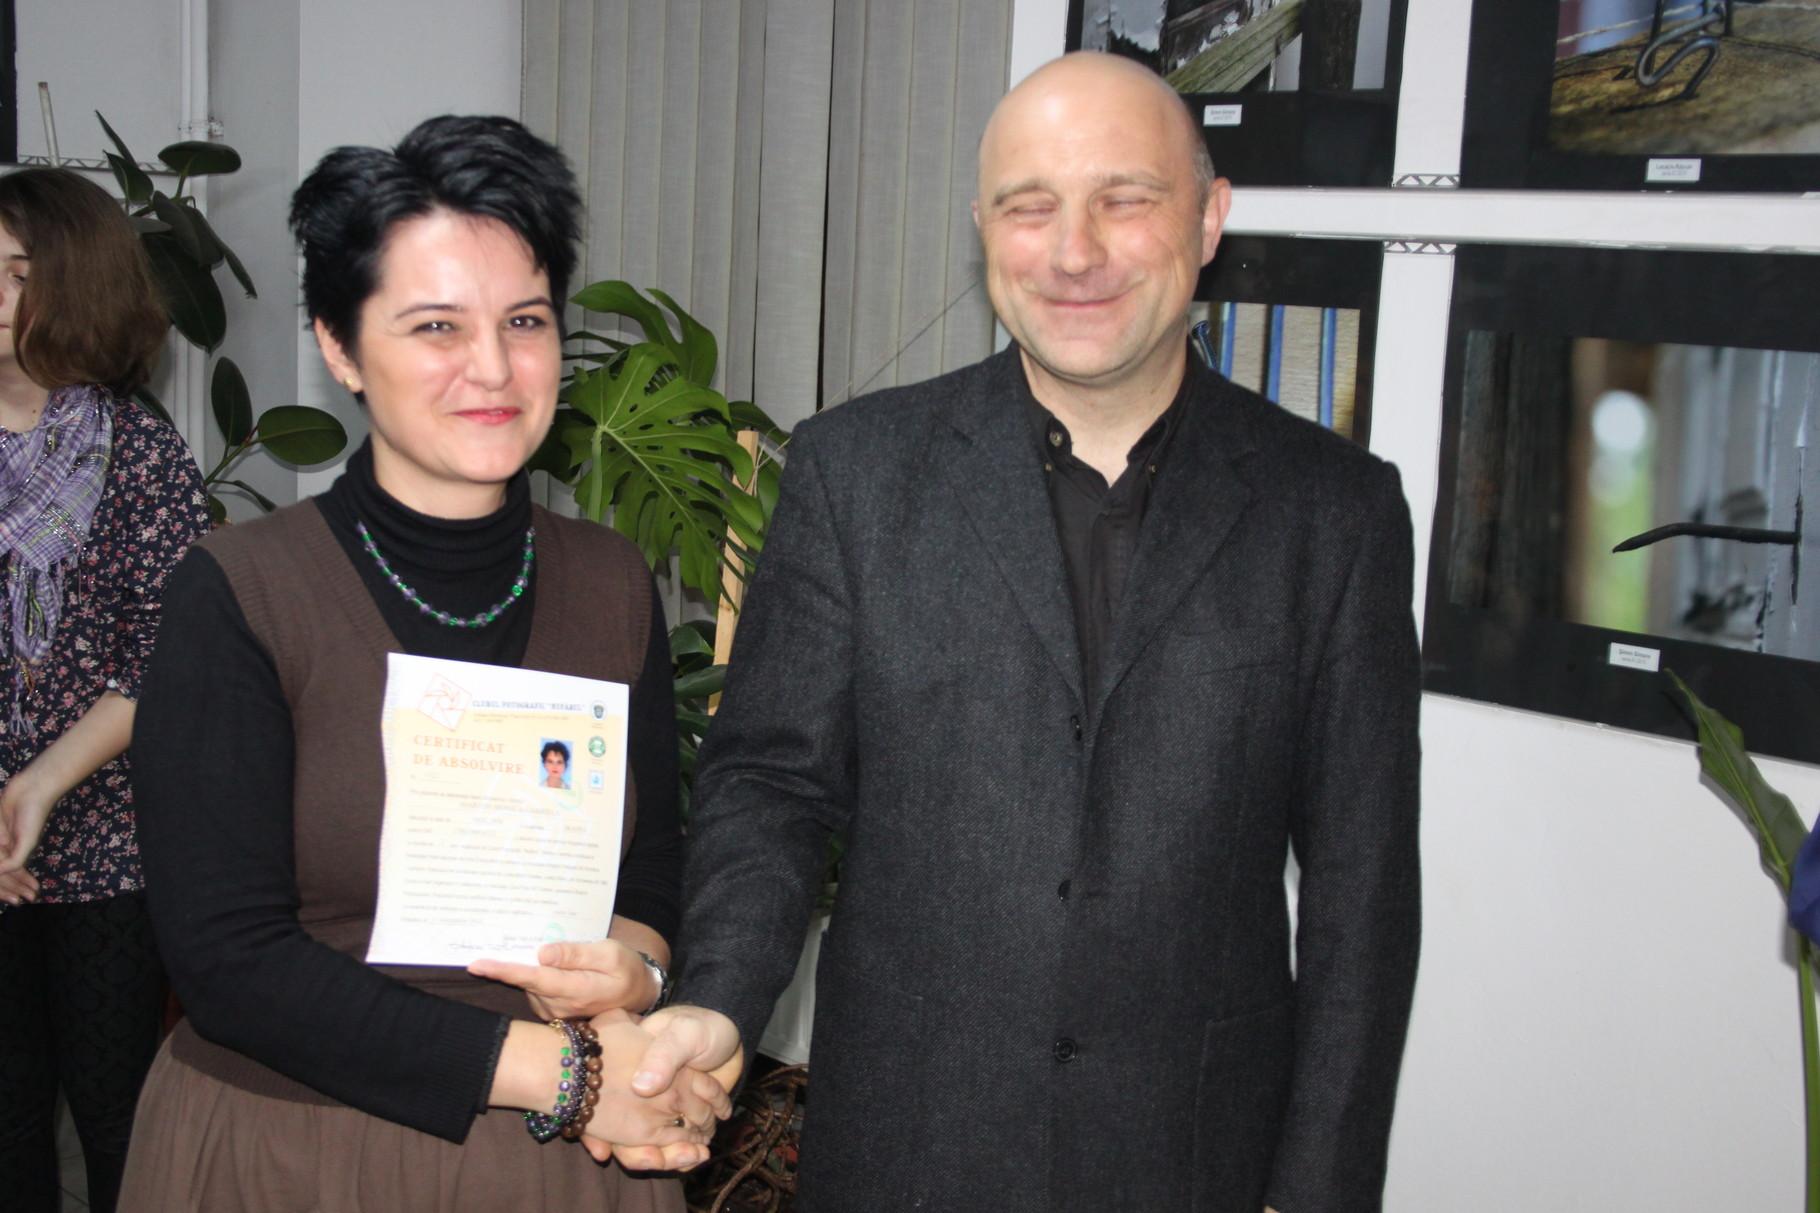 Photos by: Claudiu Szabó EFIAP